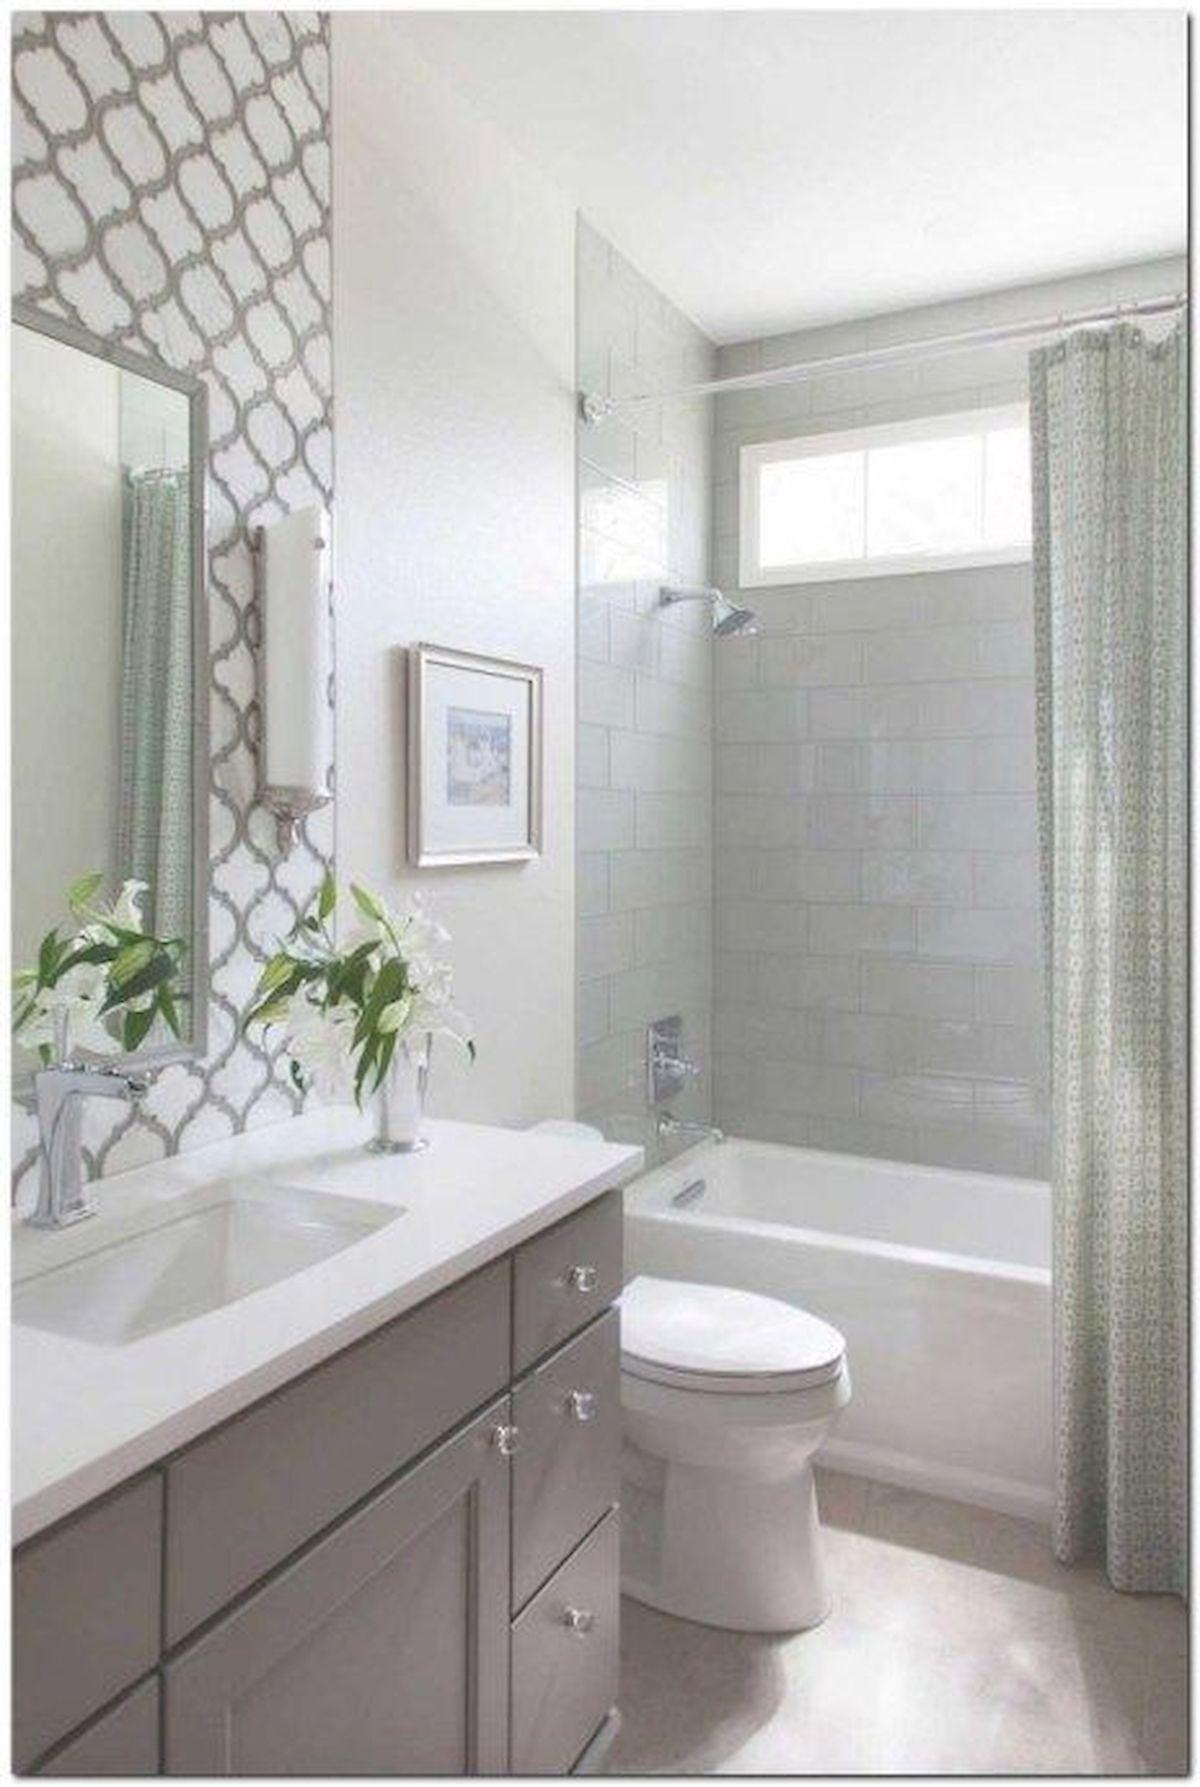 60 Elegant Small Master Bathroom Remodel Ideas (30 (With ...